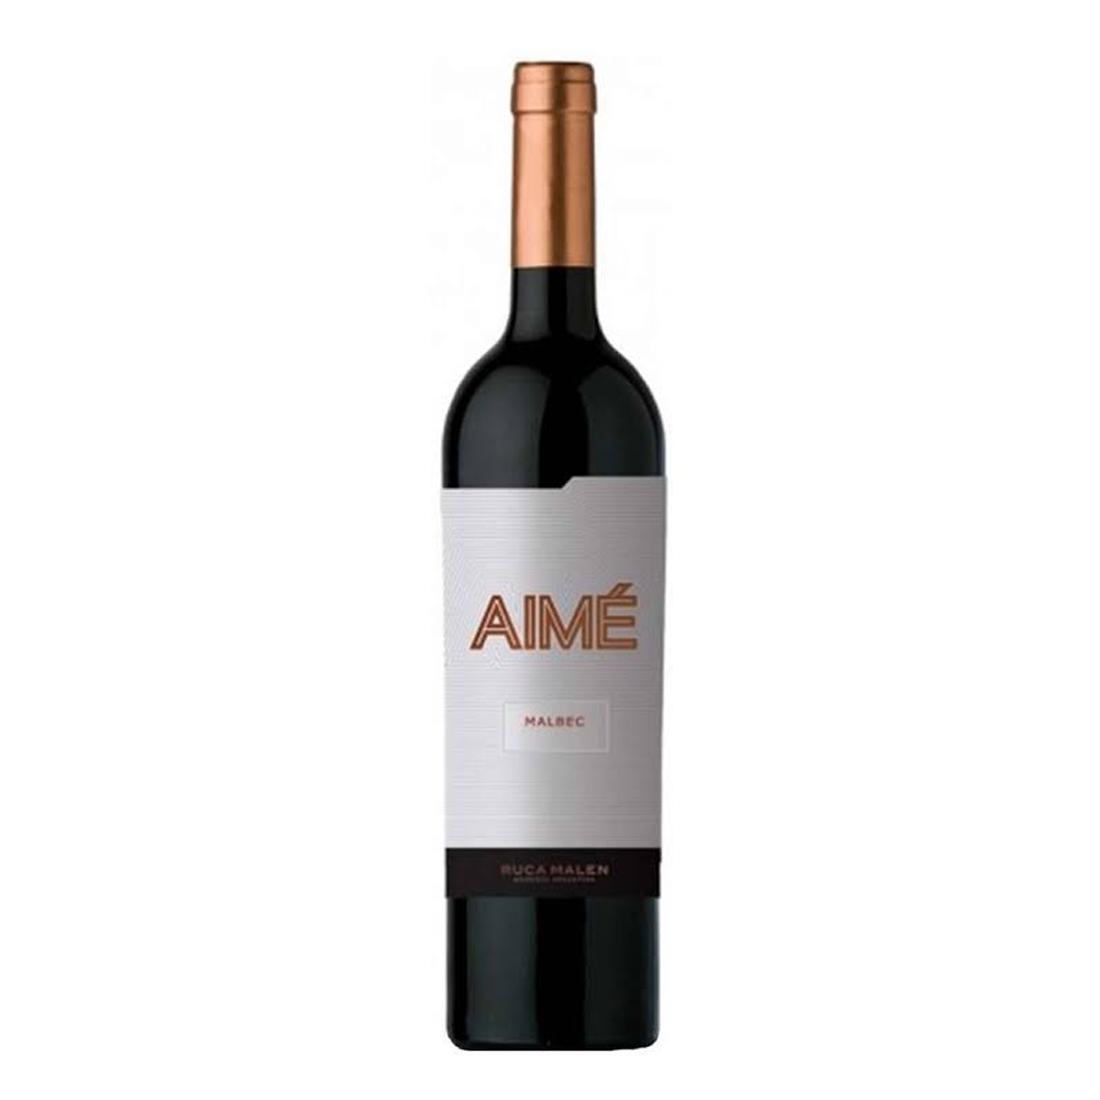 Vinho Ruca Malen Aime Malbec 750 ml